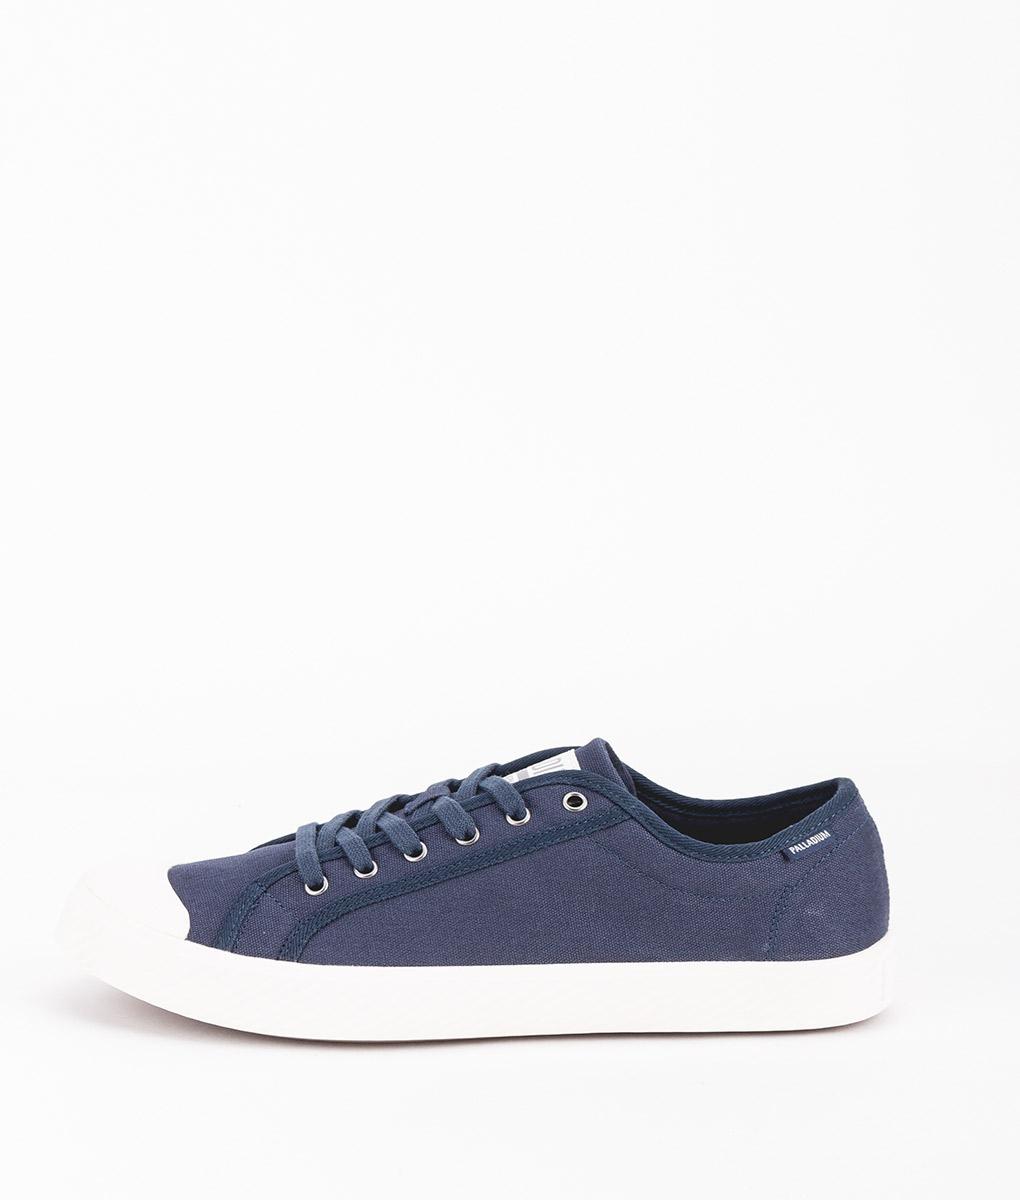 PALLADIUM Men Sneakers 75733 PALLAPHOENIX OG CVS, Indigo 69.99